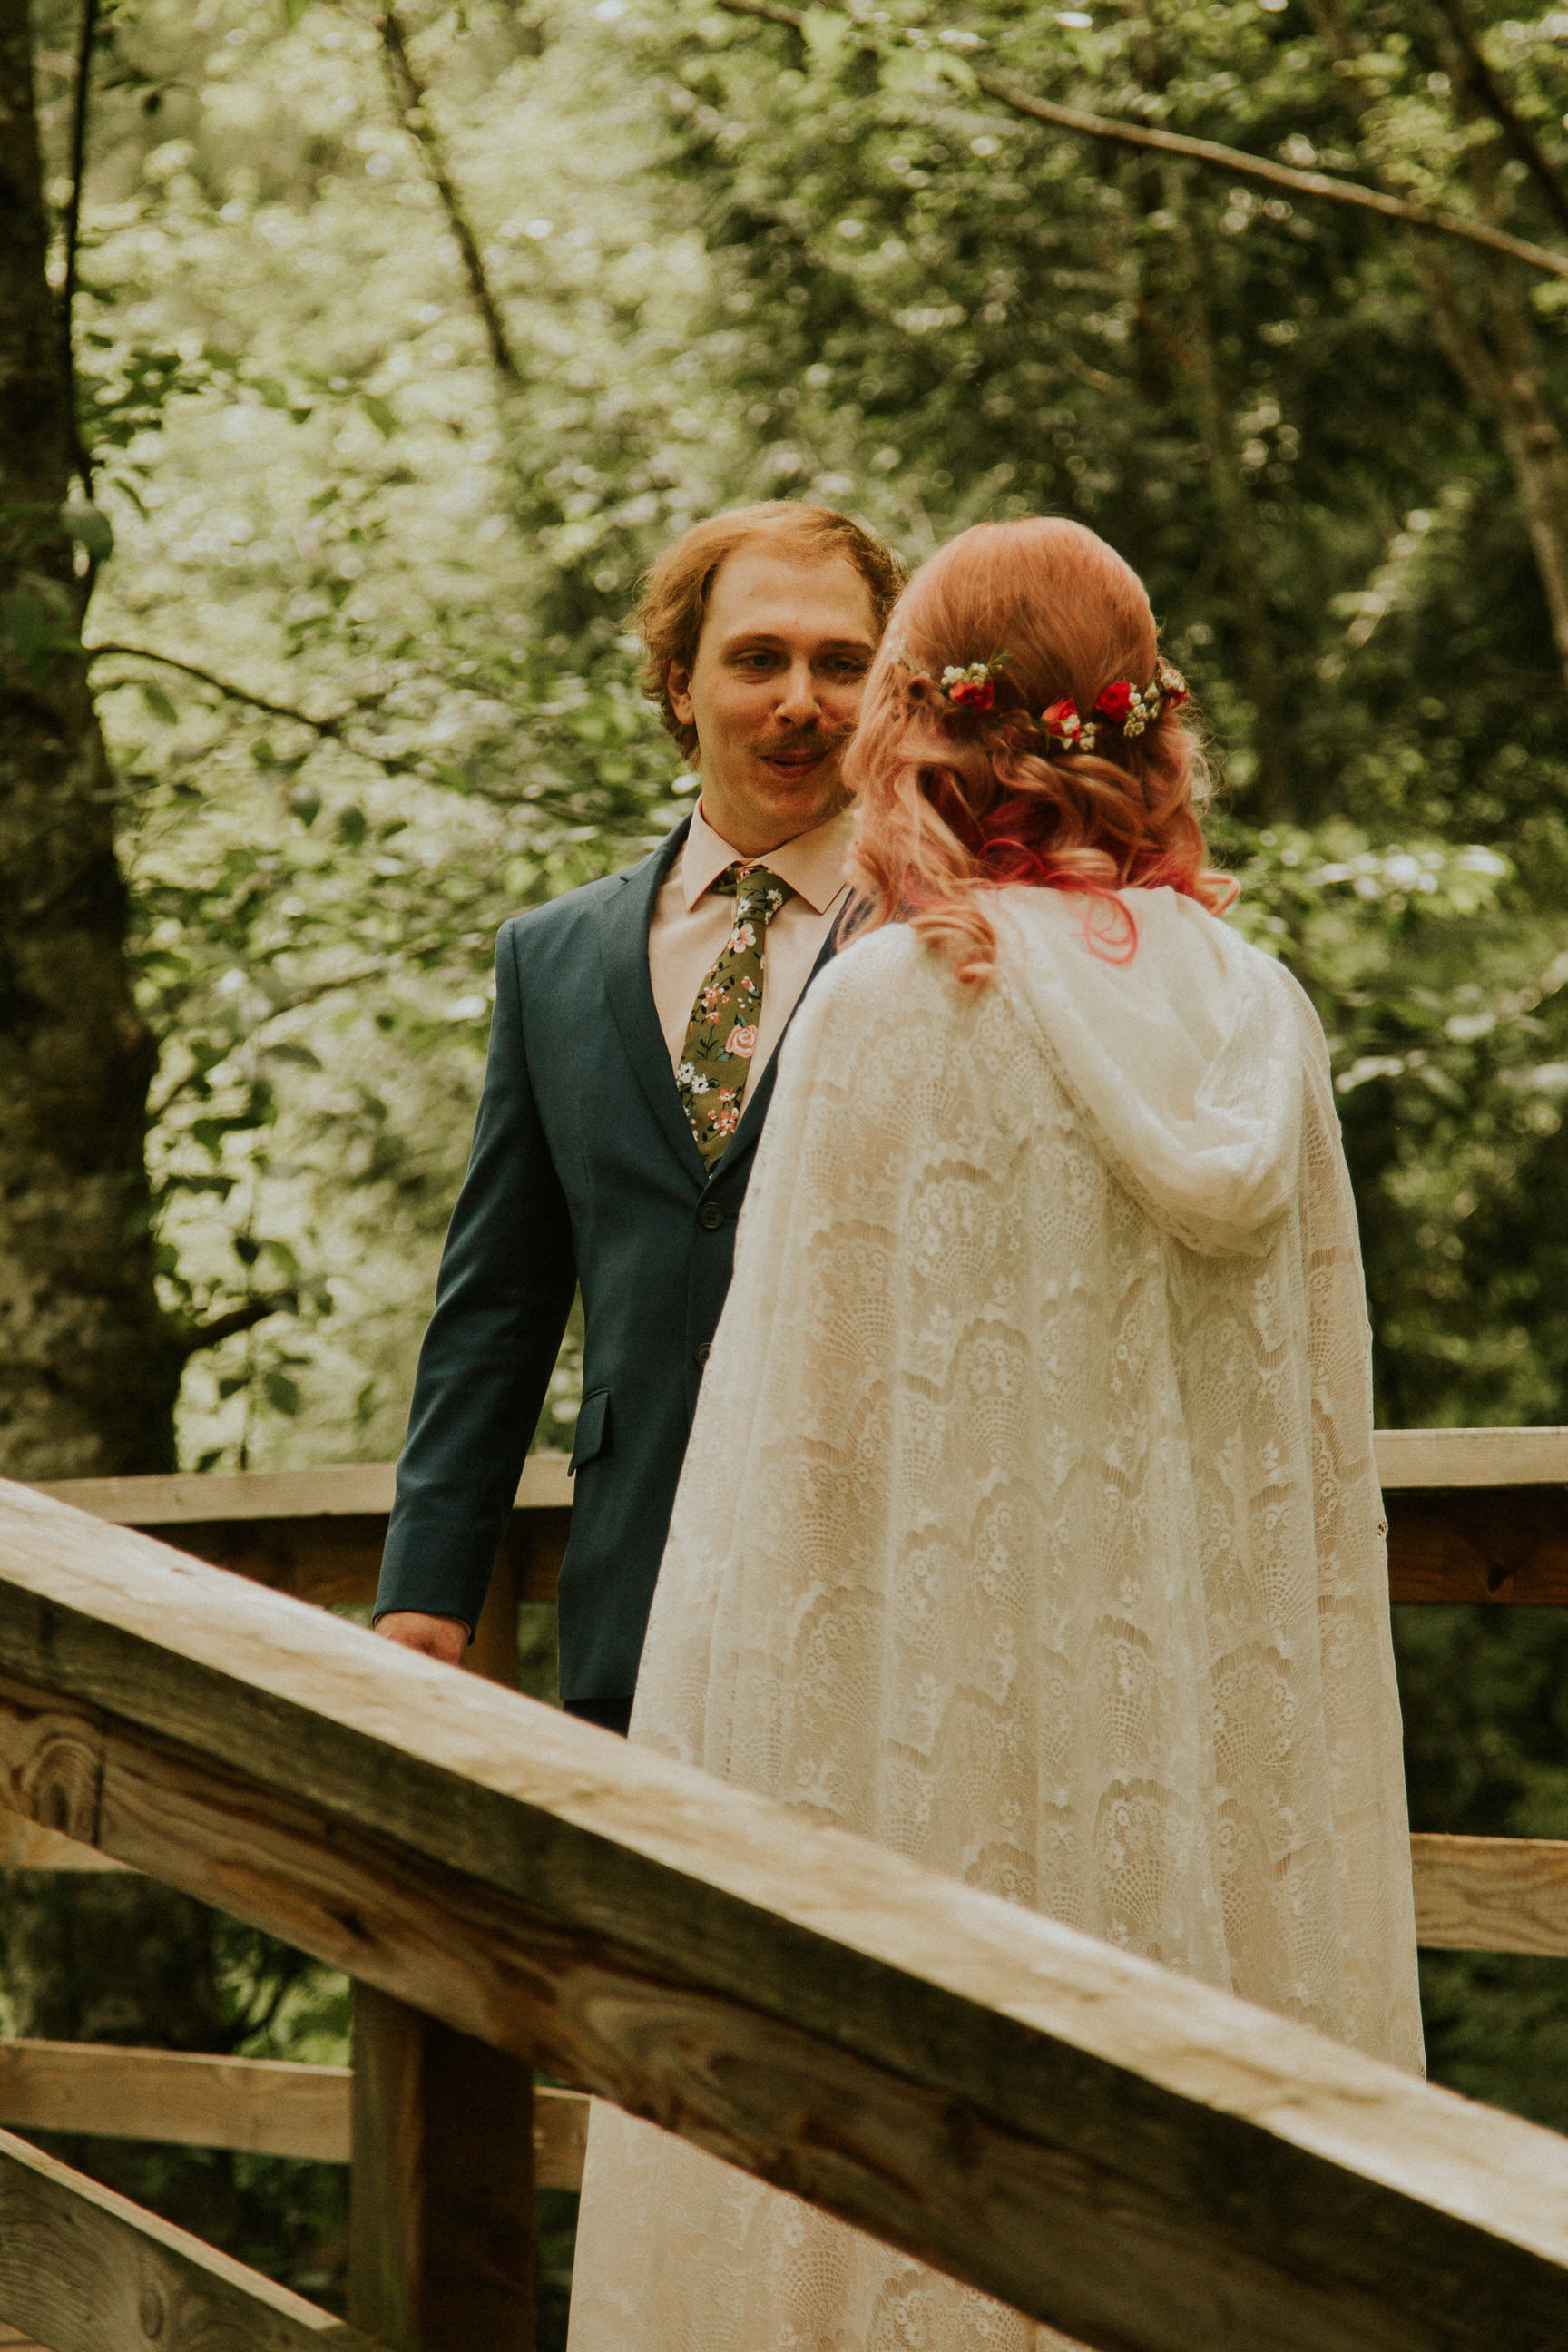 cedar springs elopement first look